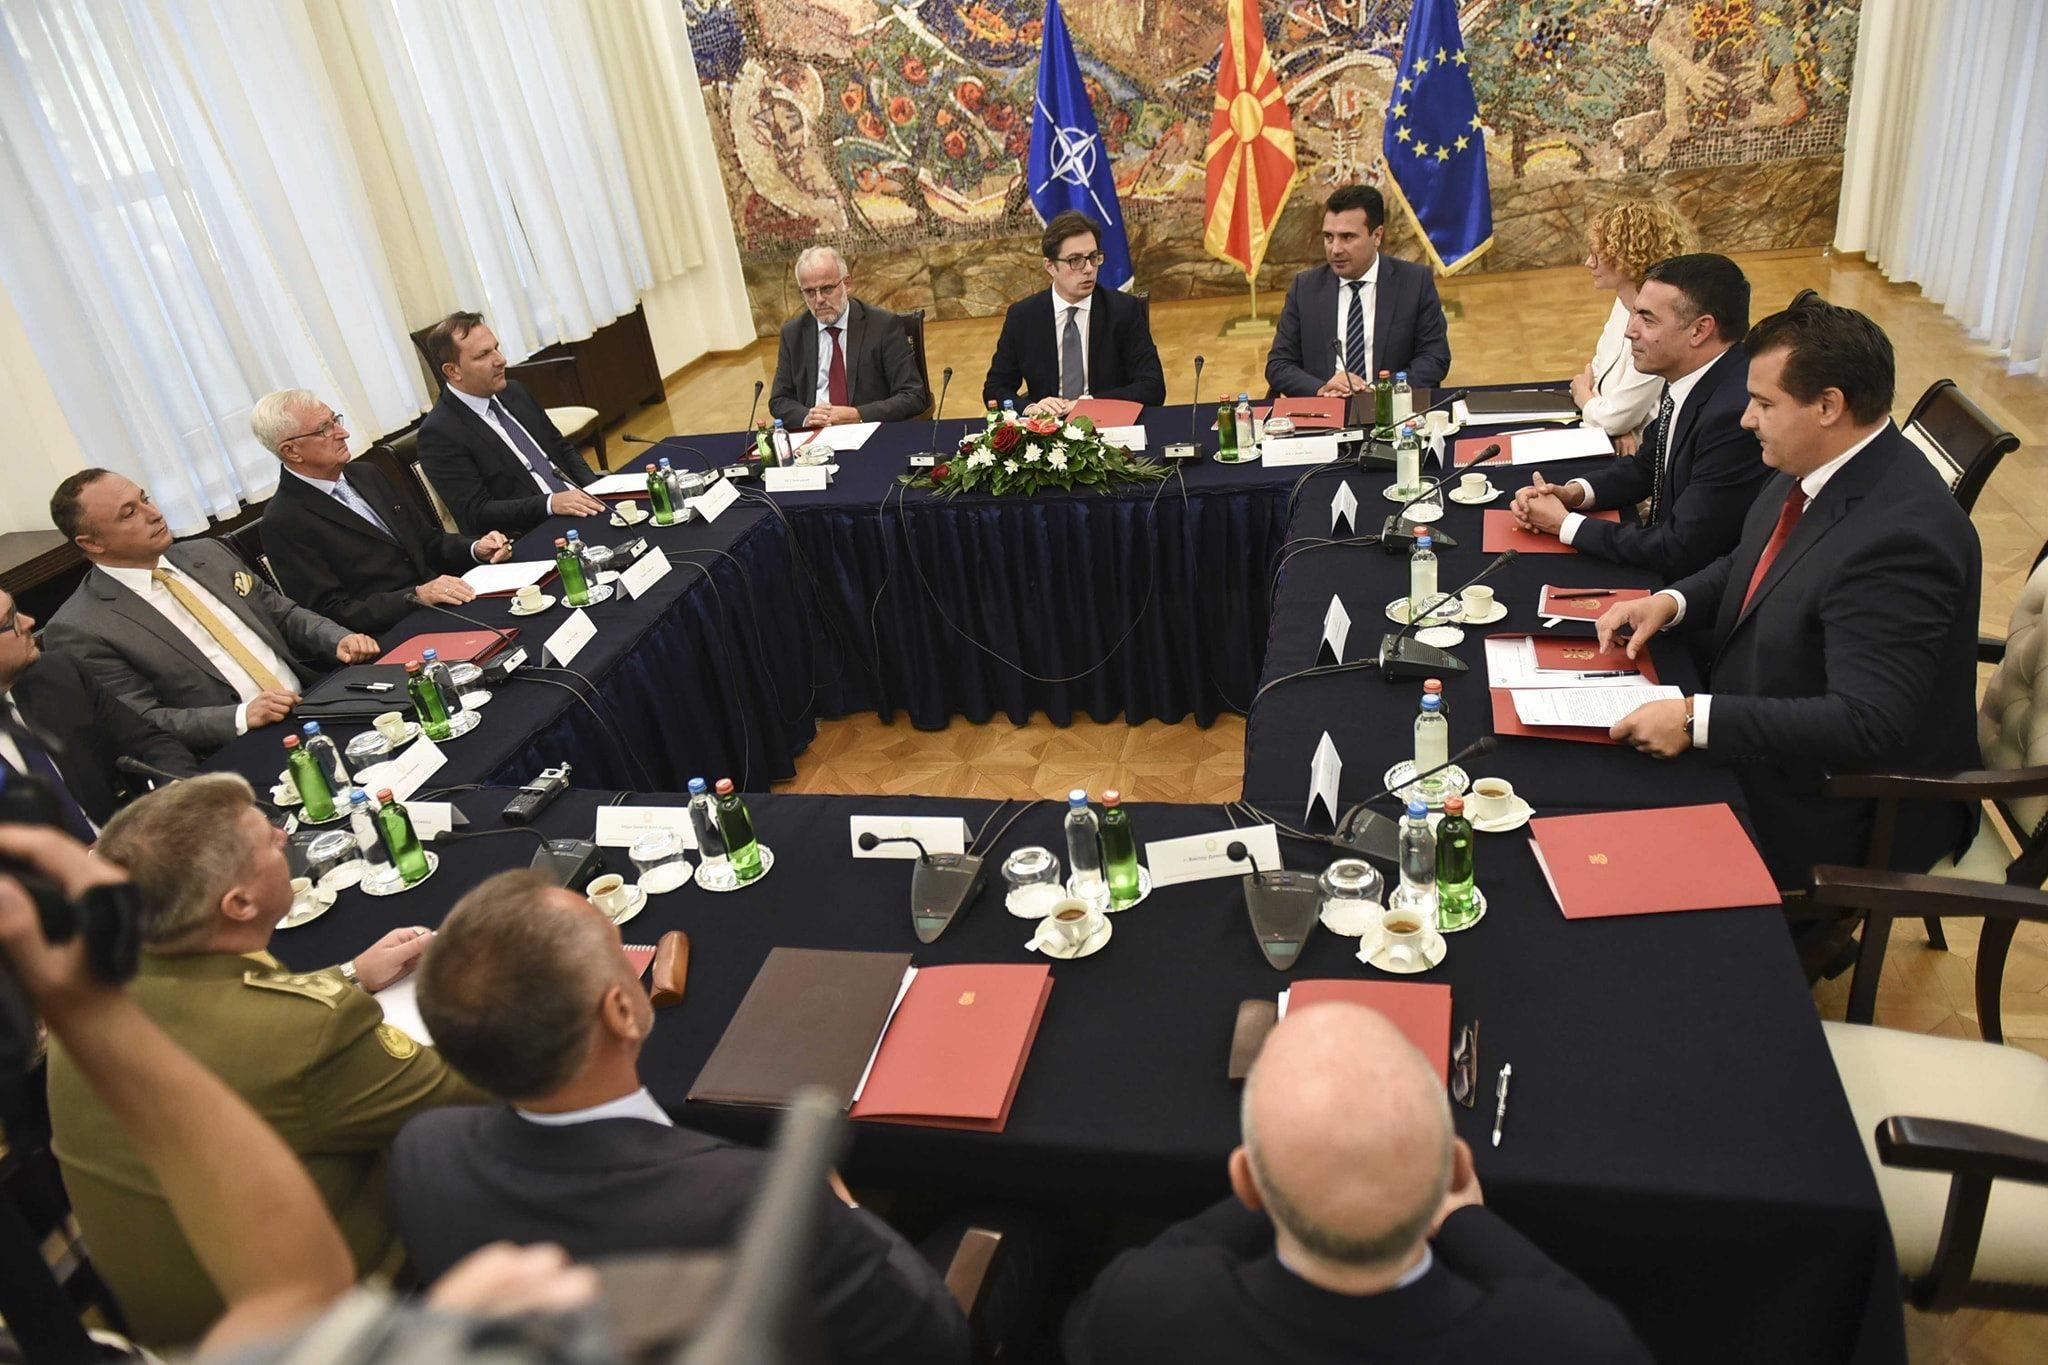 Pendarovski: North Macedonia may face turbulent situations